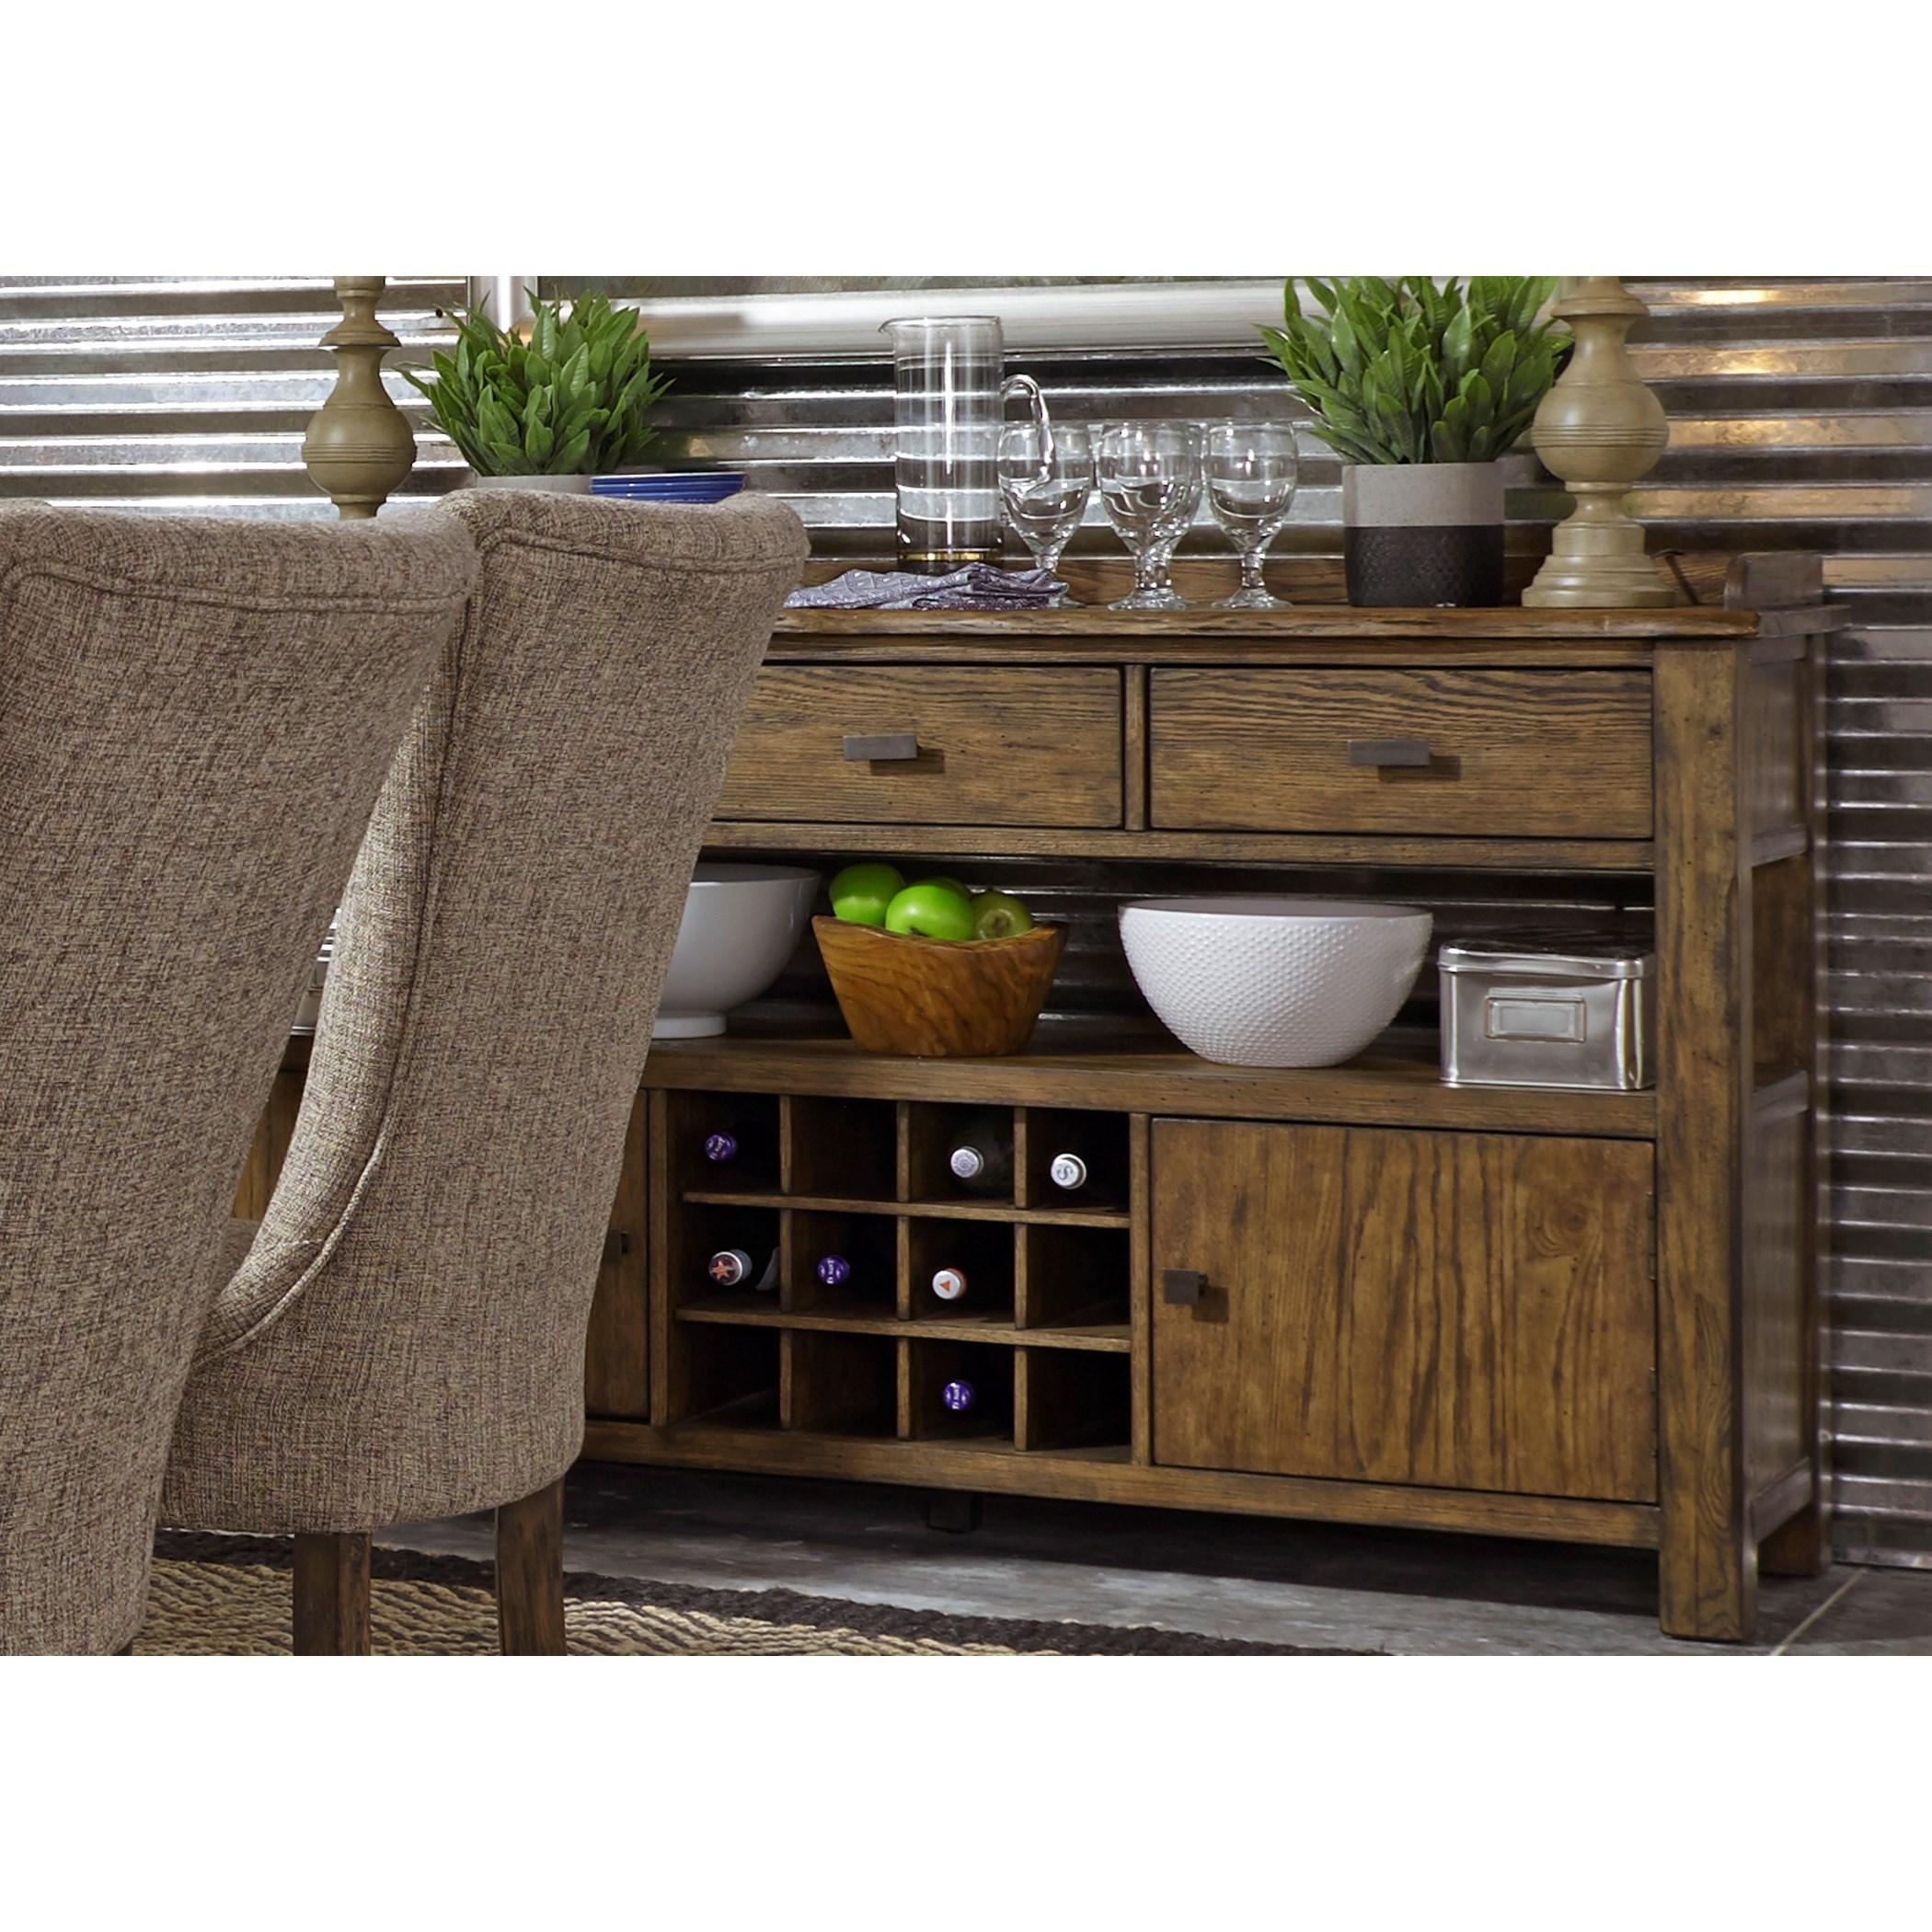 Havenbrook Havenbrook Sideboard by Liberty Furniture at Lapeer Furniture & Mattress Center